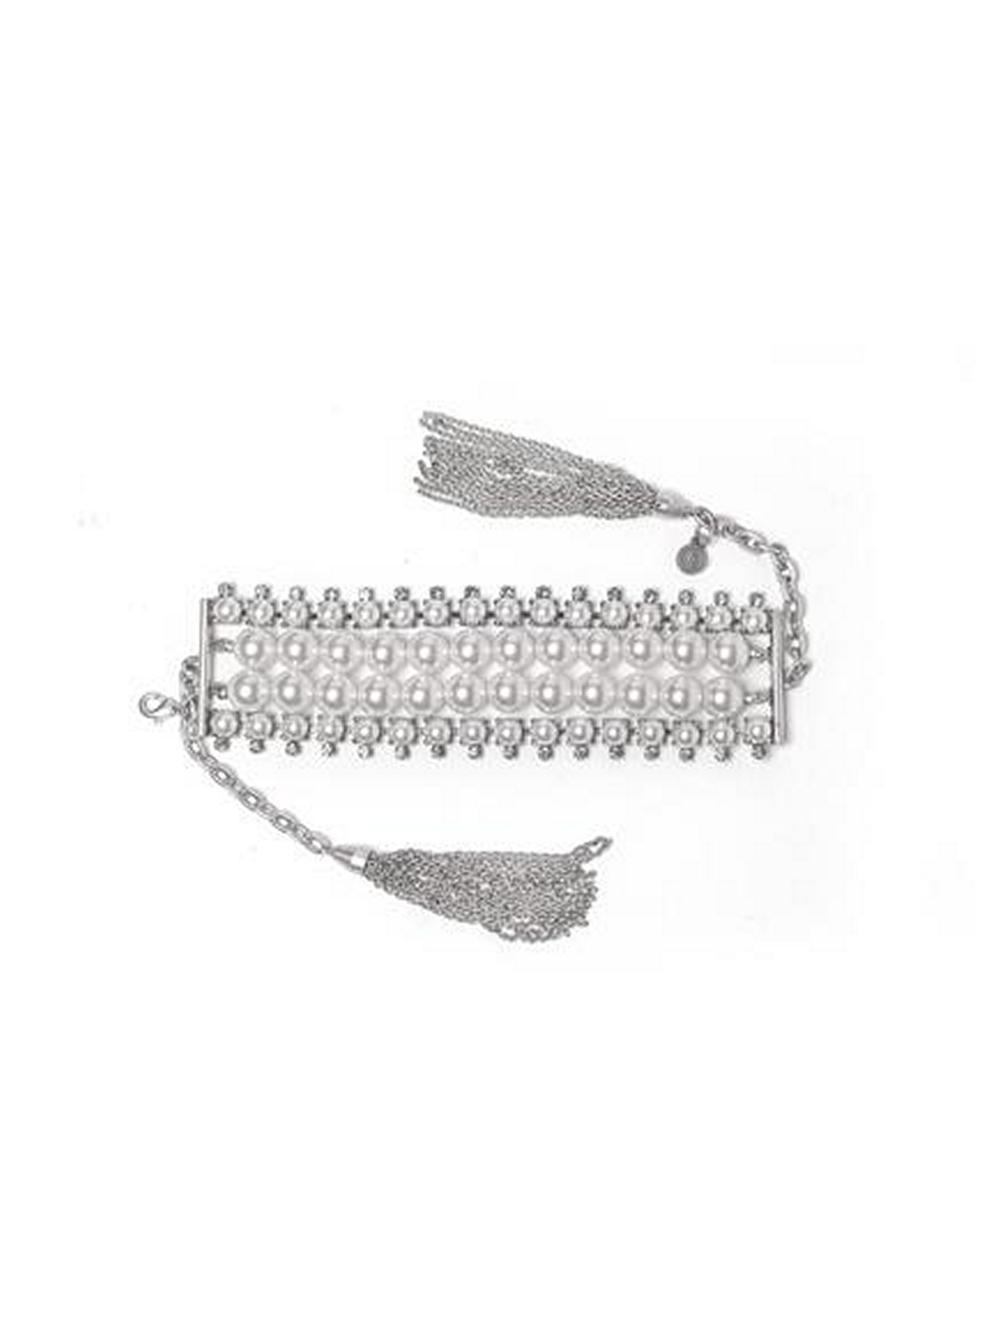 Tegan Bracelet Item # D-B-TEGAN205